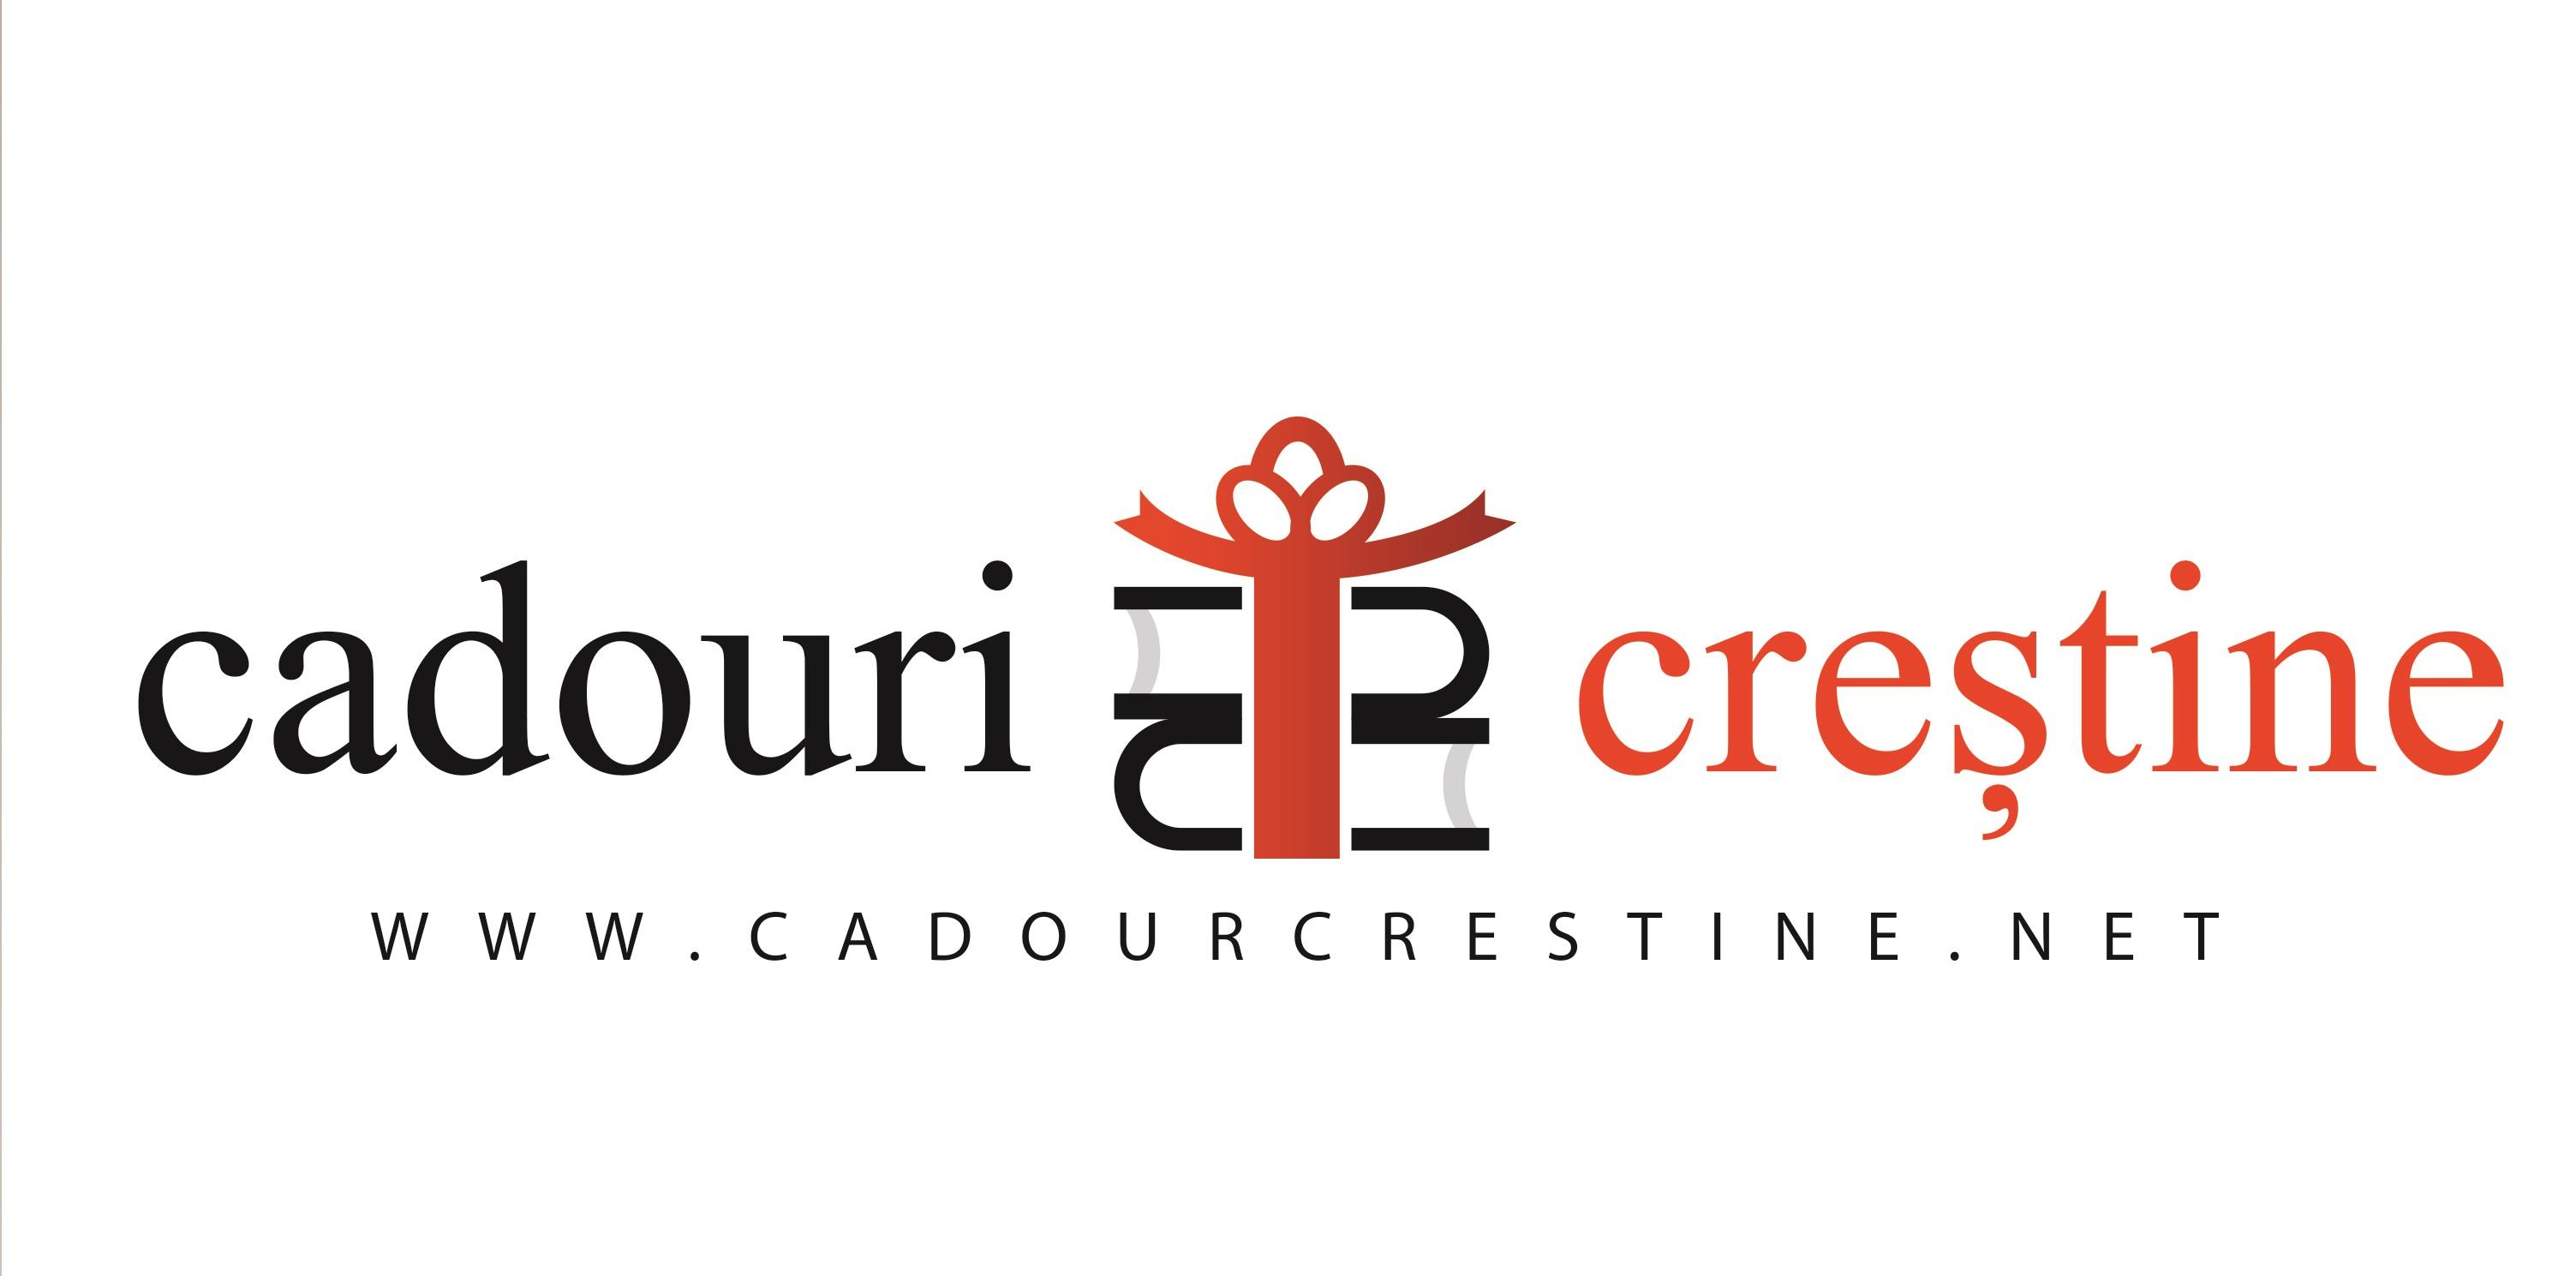 Cadouri Crestine